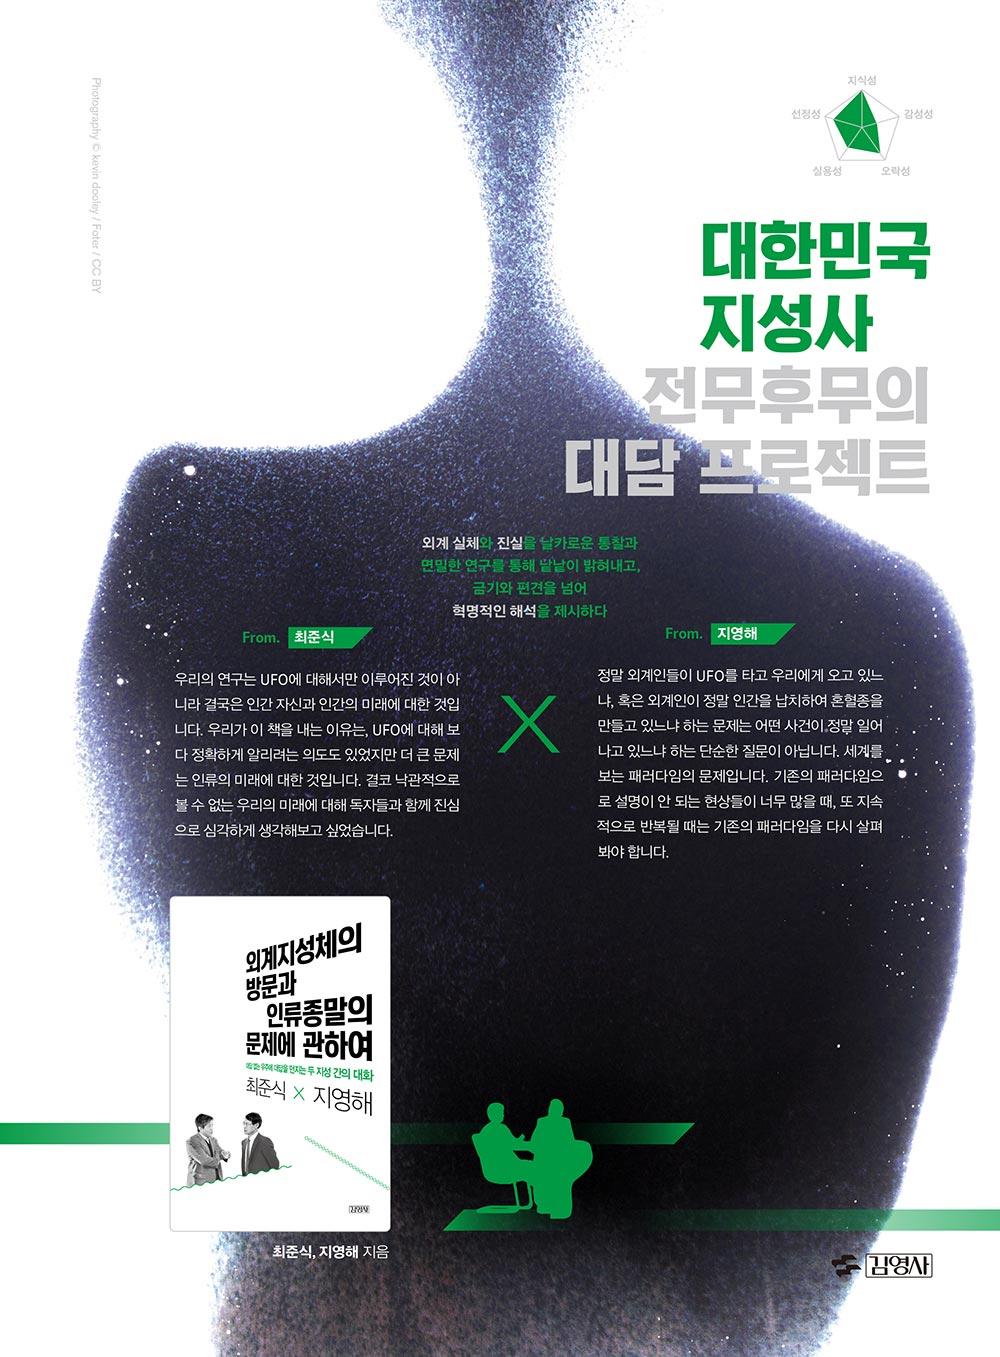 011_interview_book_02